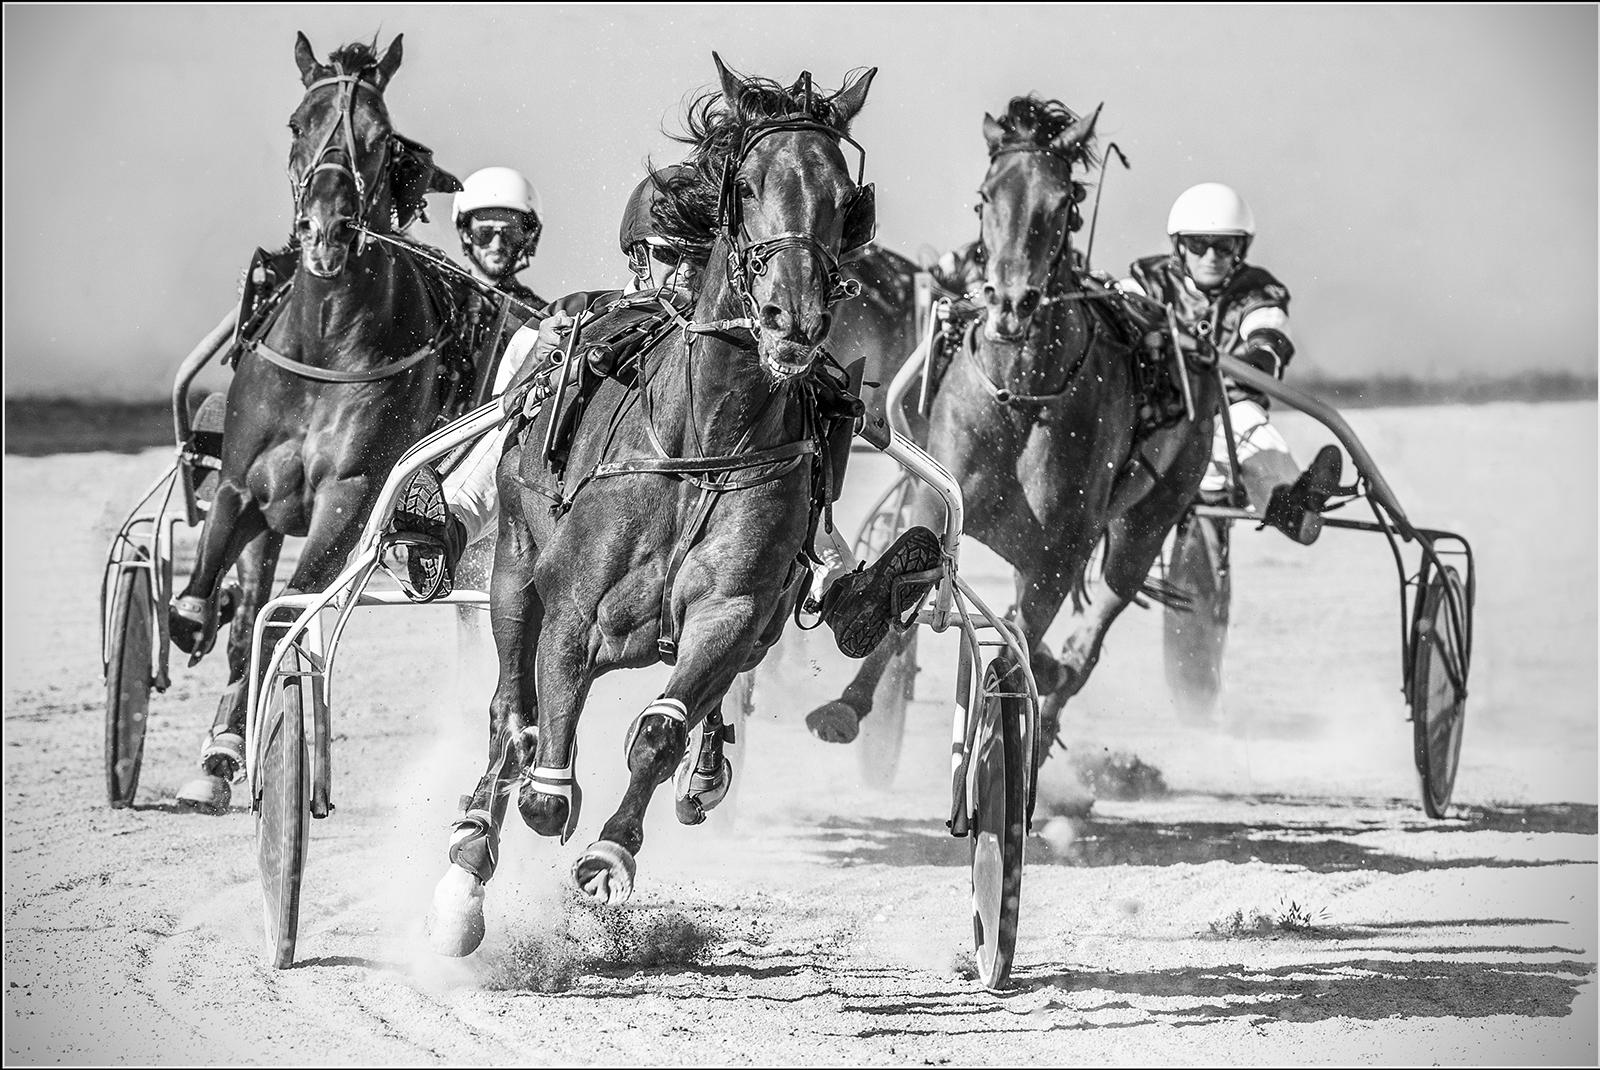 242_Race to the Finish_Jim Budd.jpg